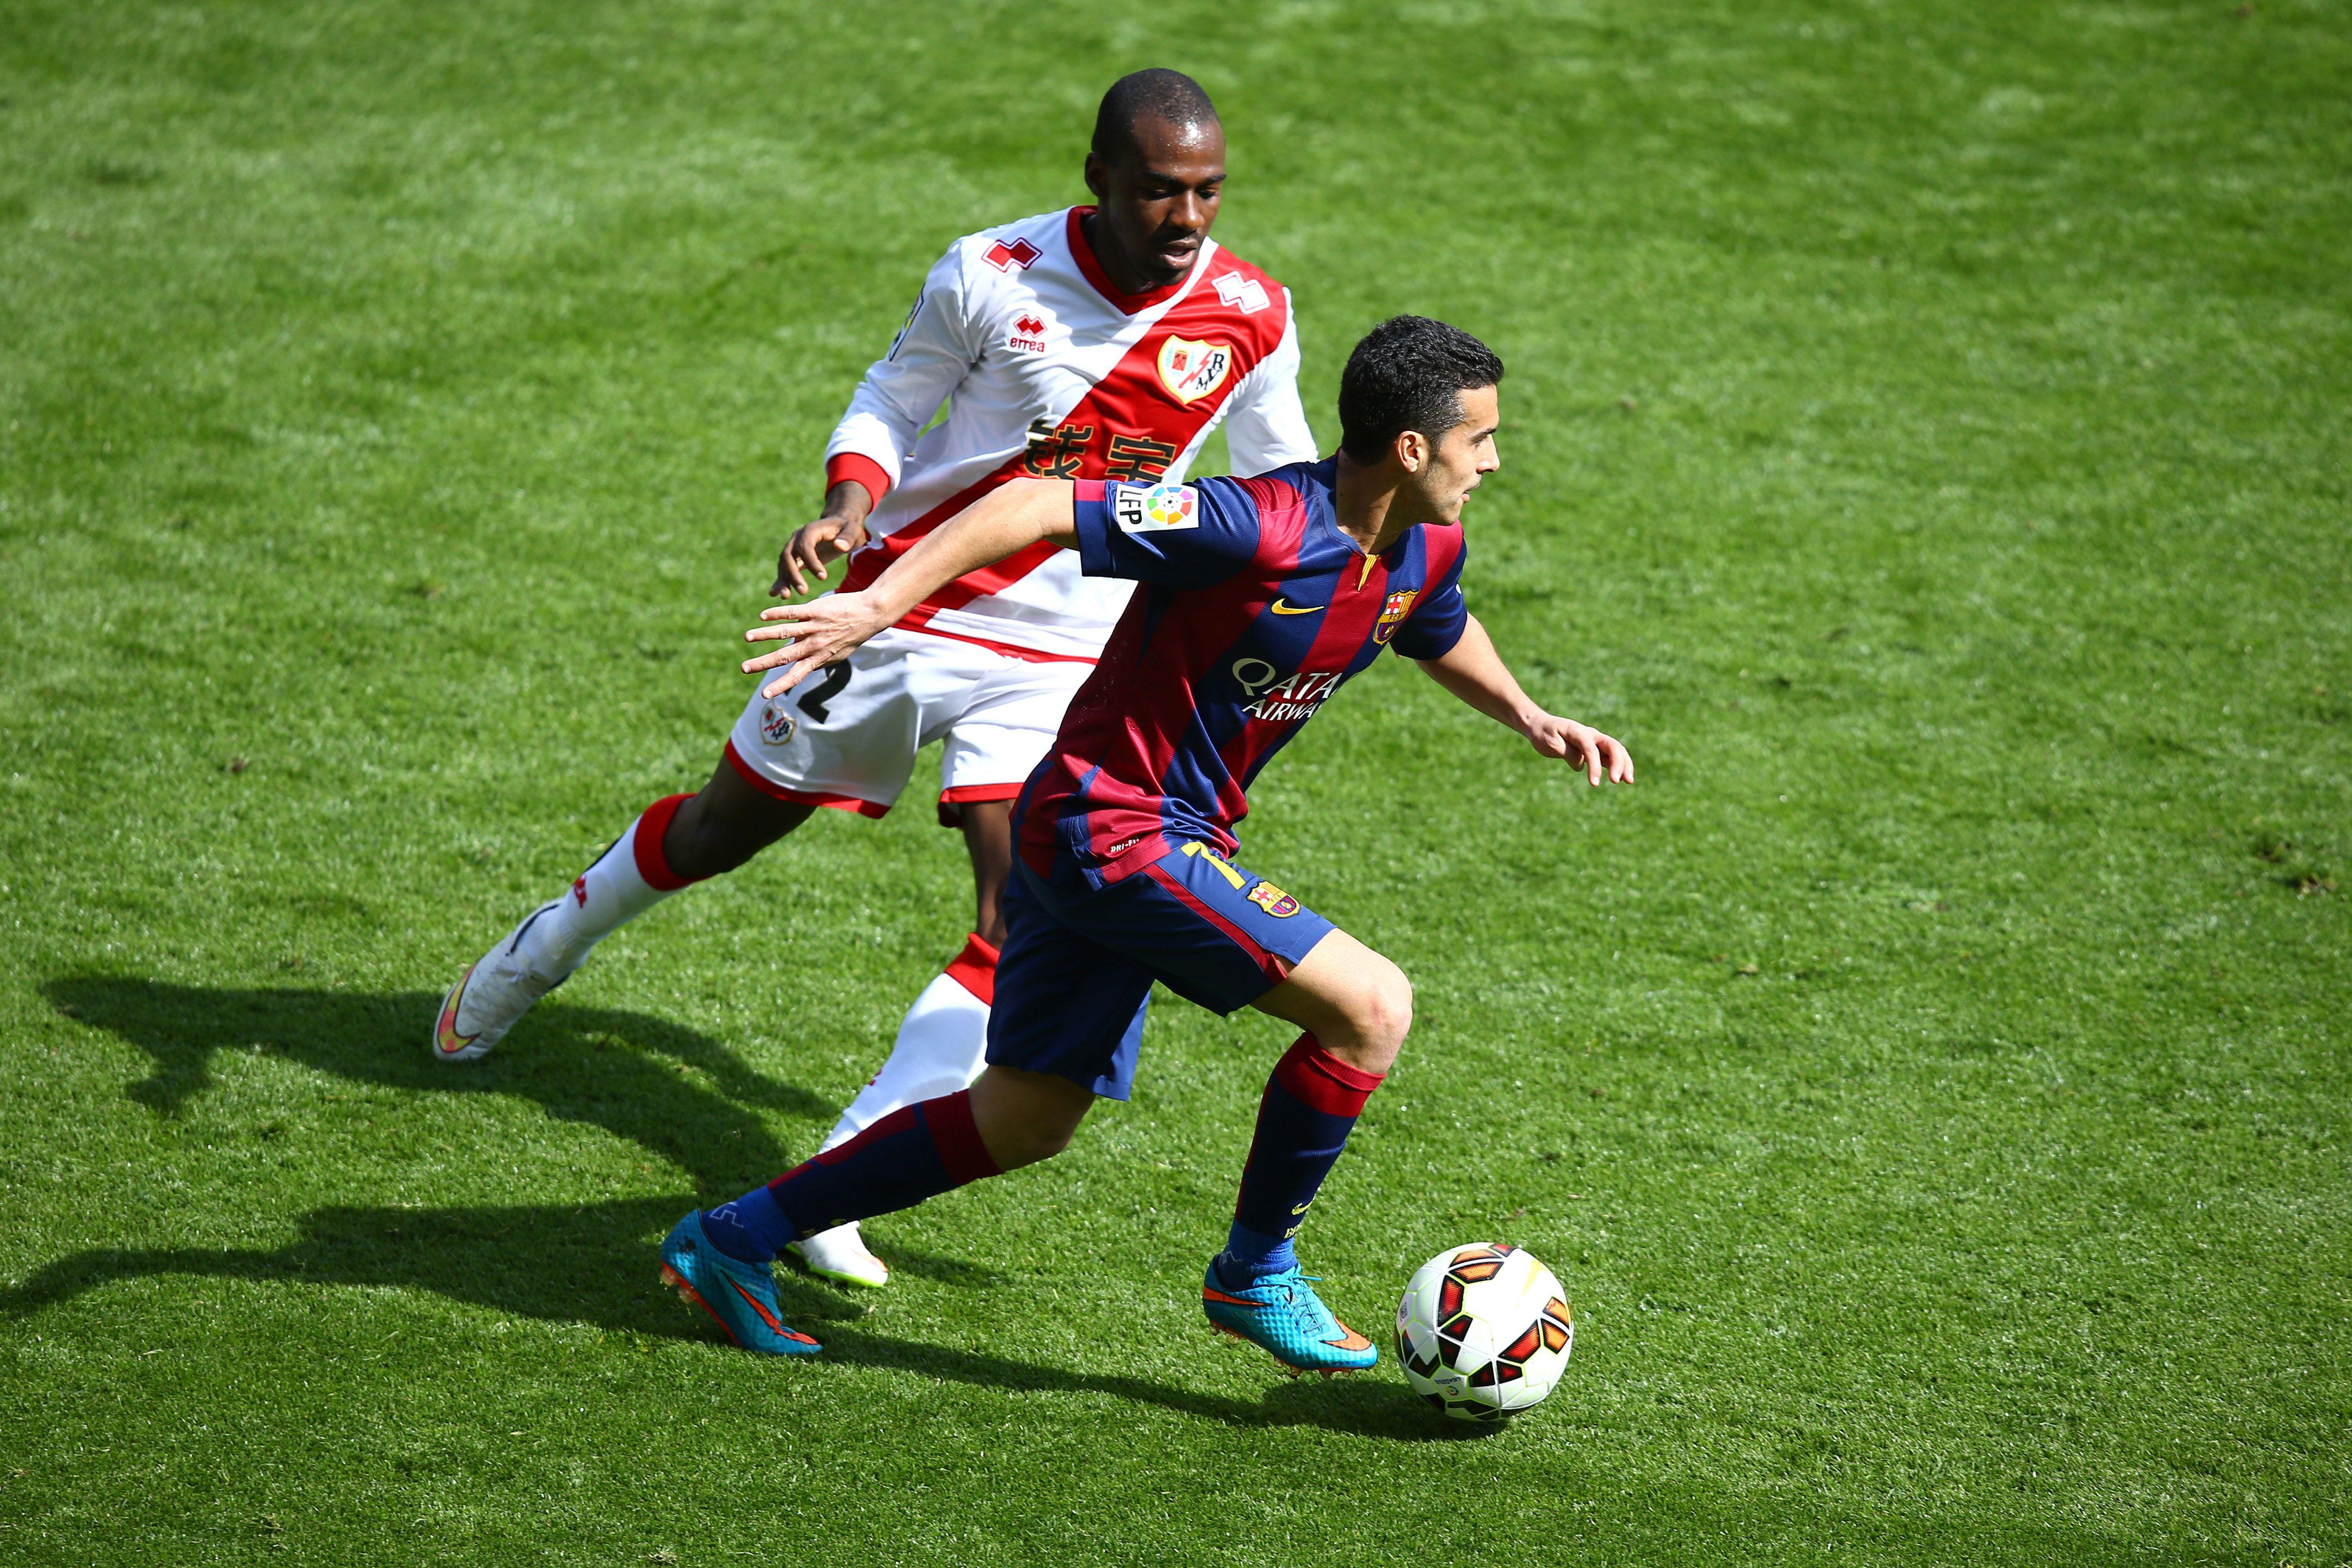 Pedro on Barcelona with ball